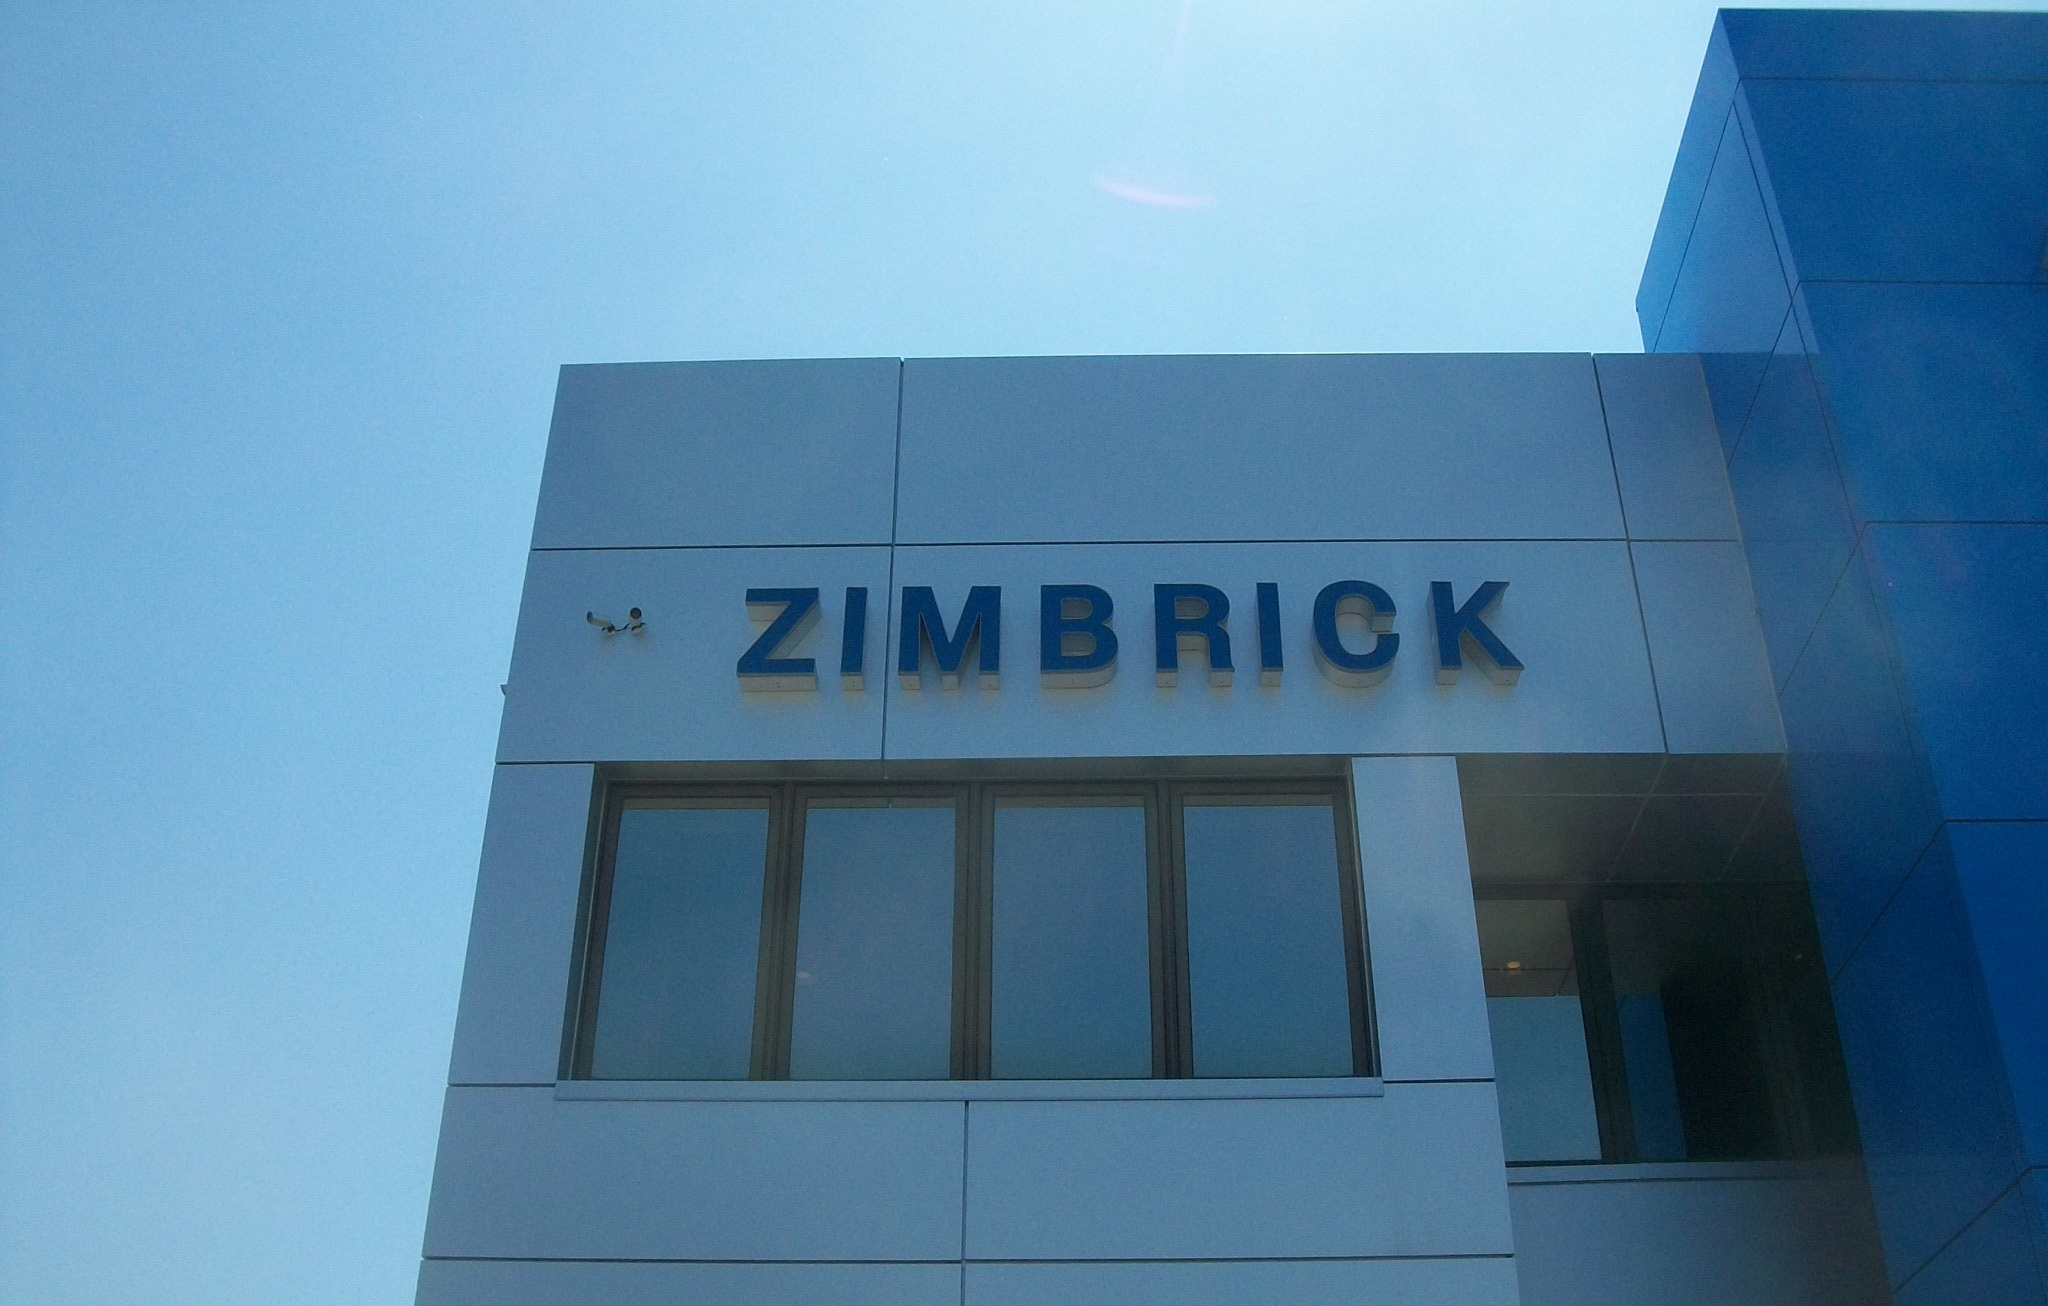 Zimbrick Chevrolet, After Rapid Re-Clad Program (Sun Prairie)